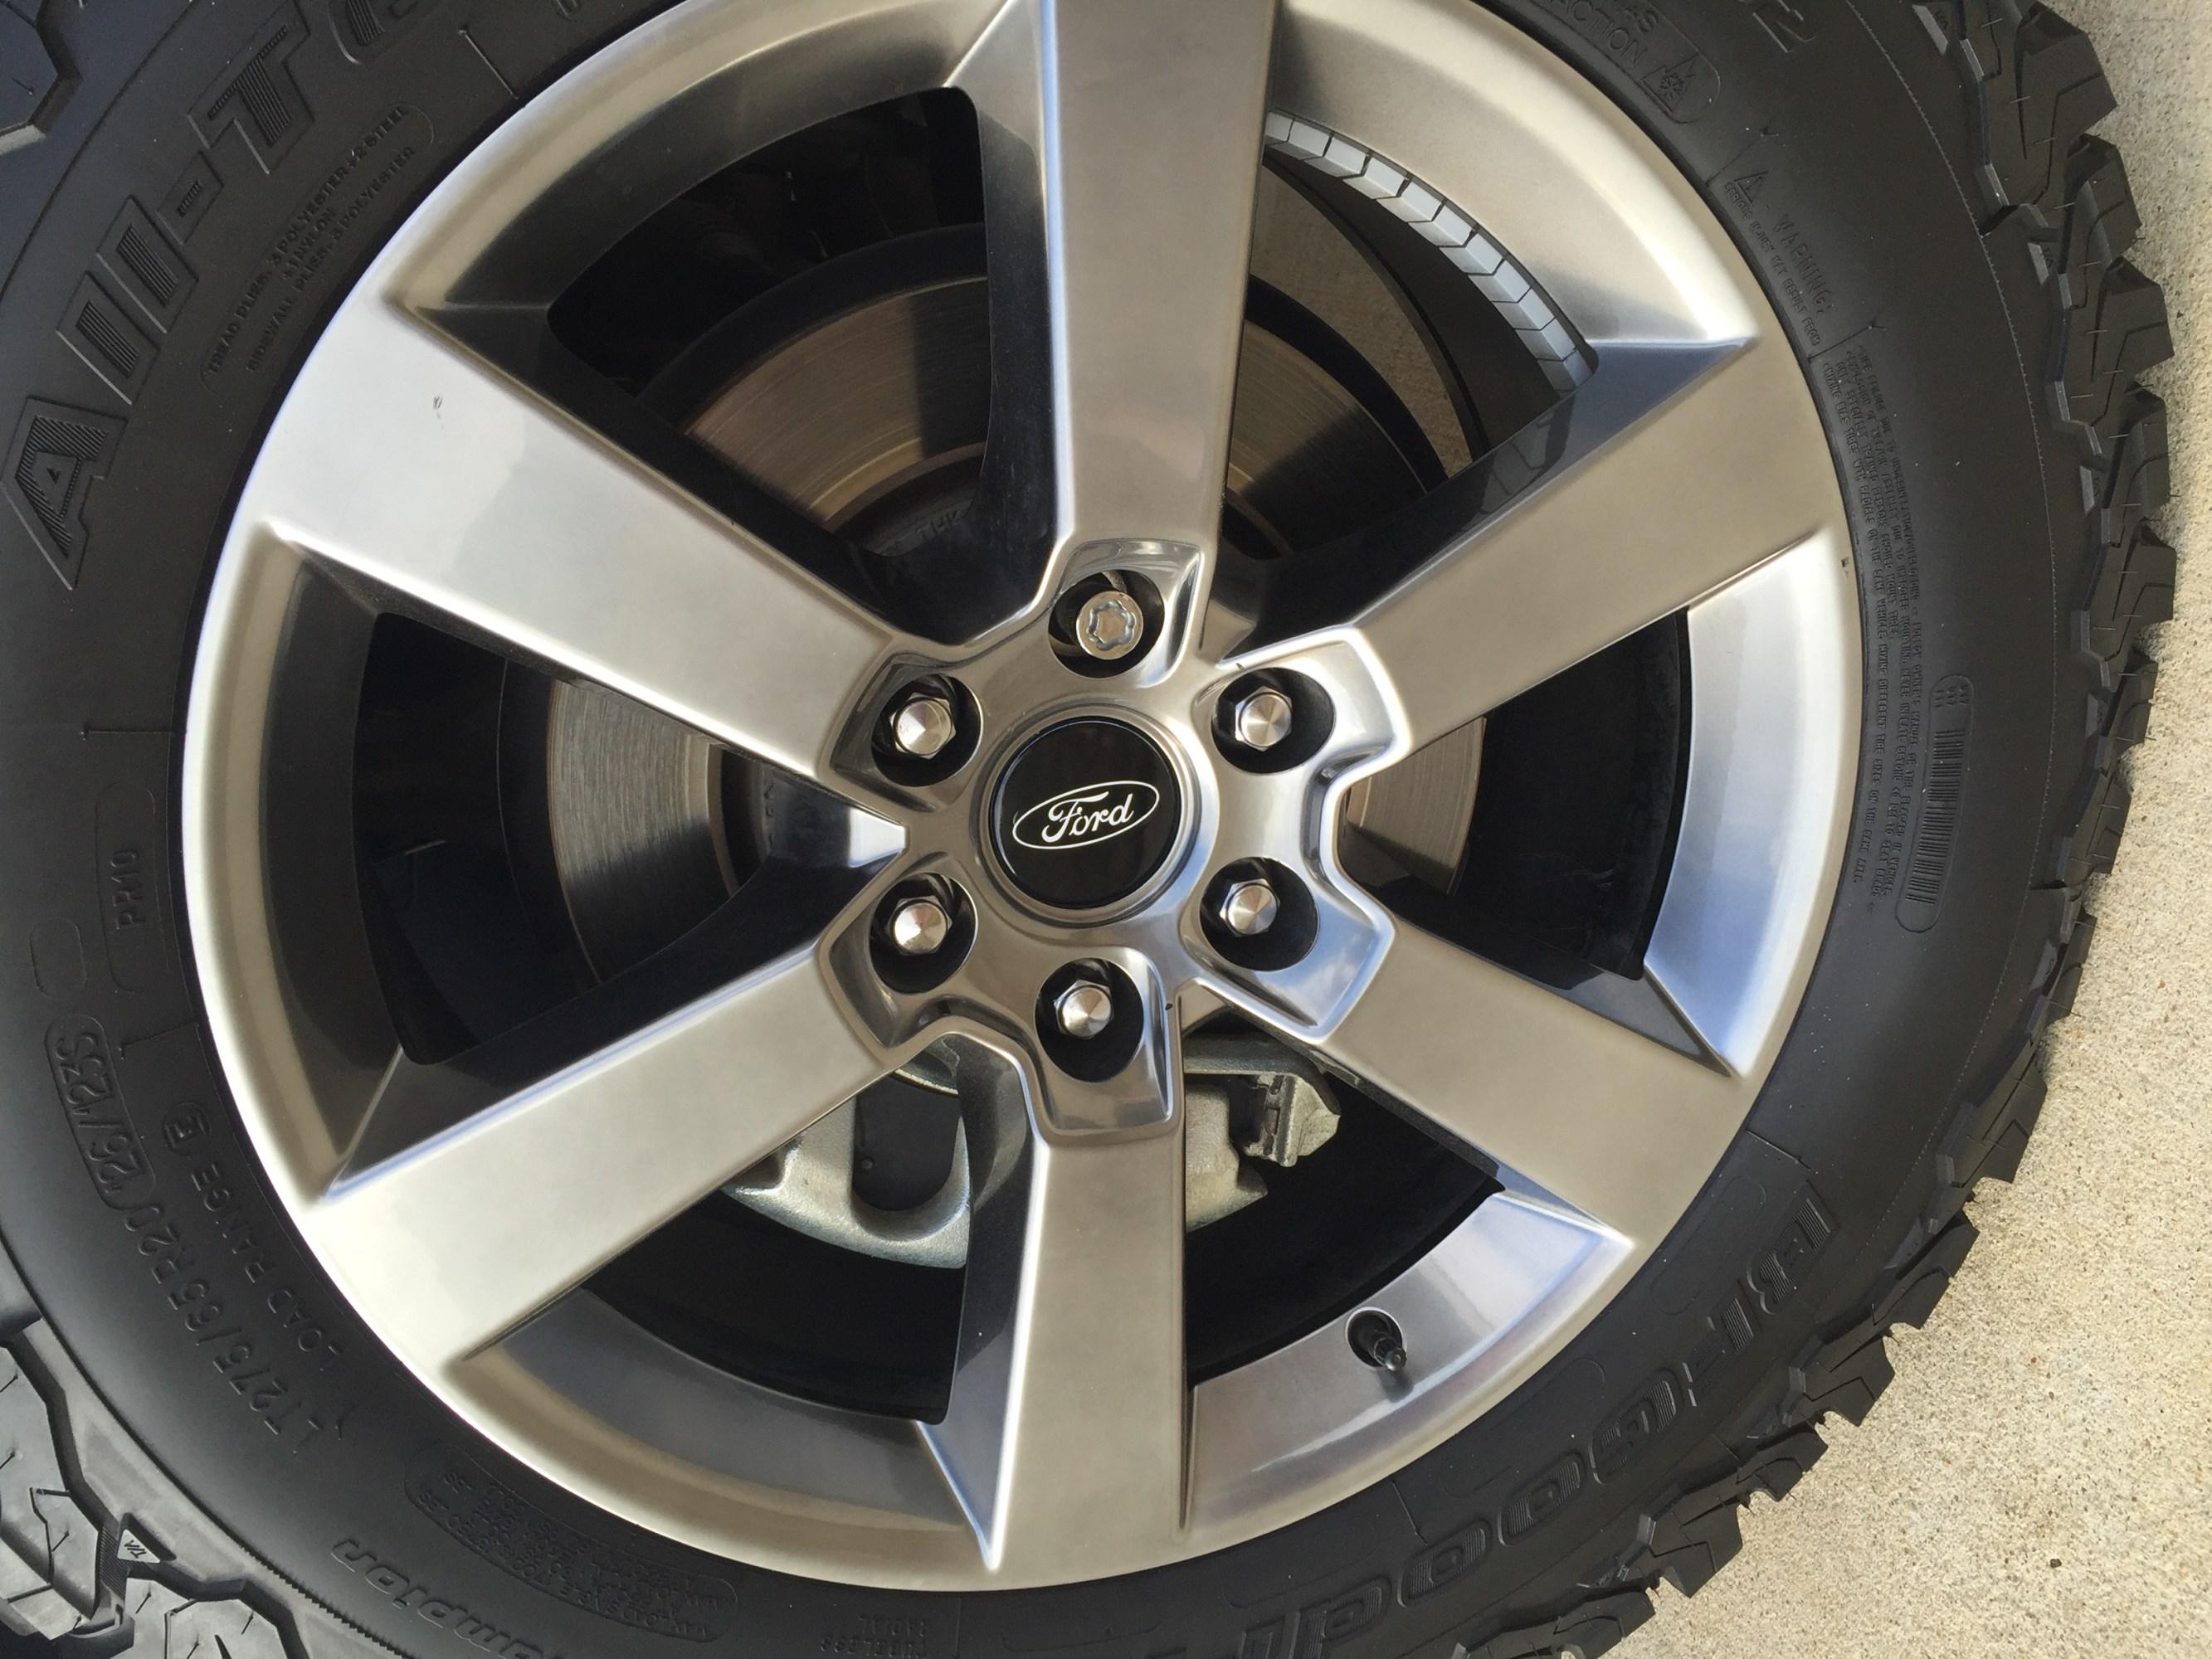 hight resolution of center cap 2015 f150 wheels img 4601 jpg